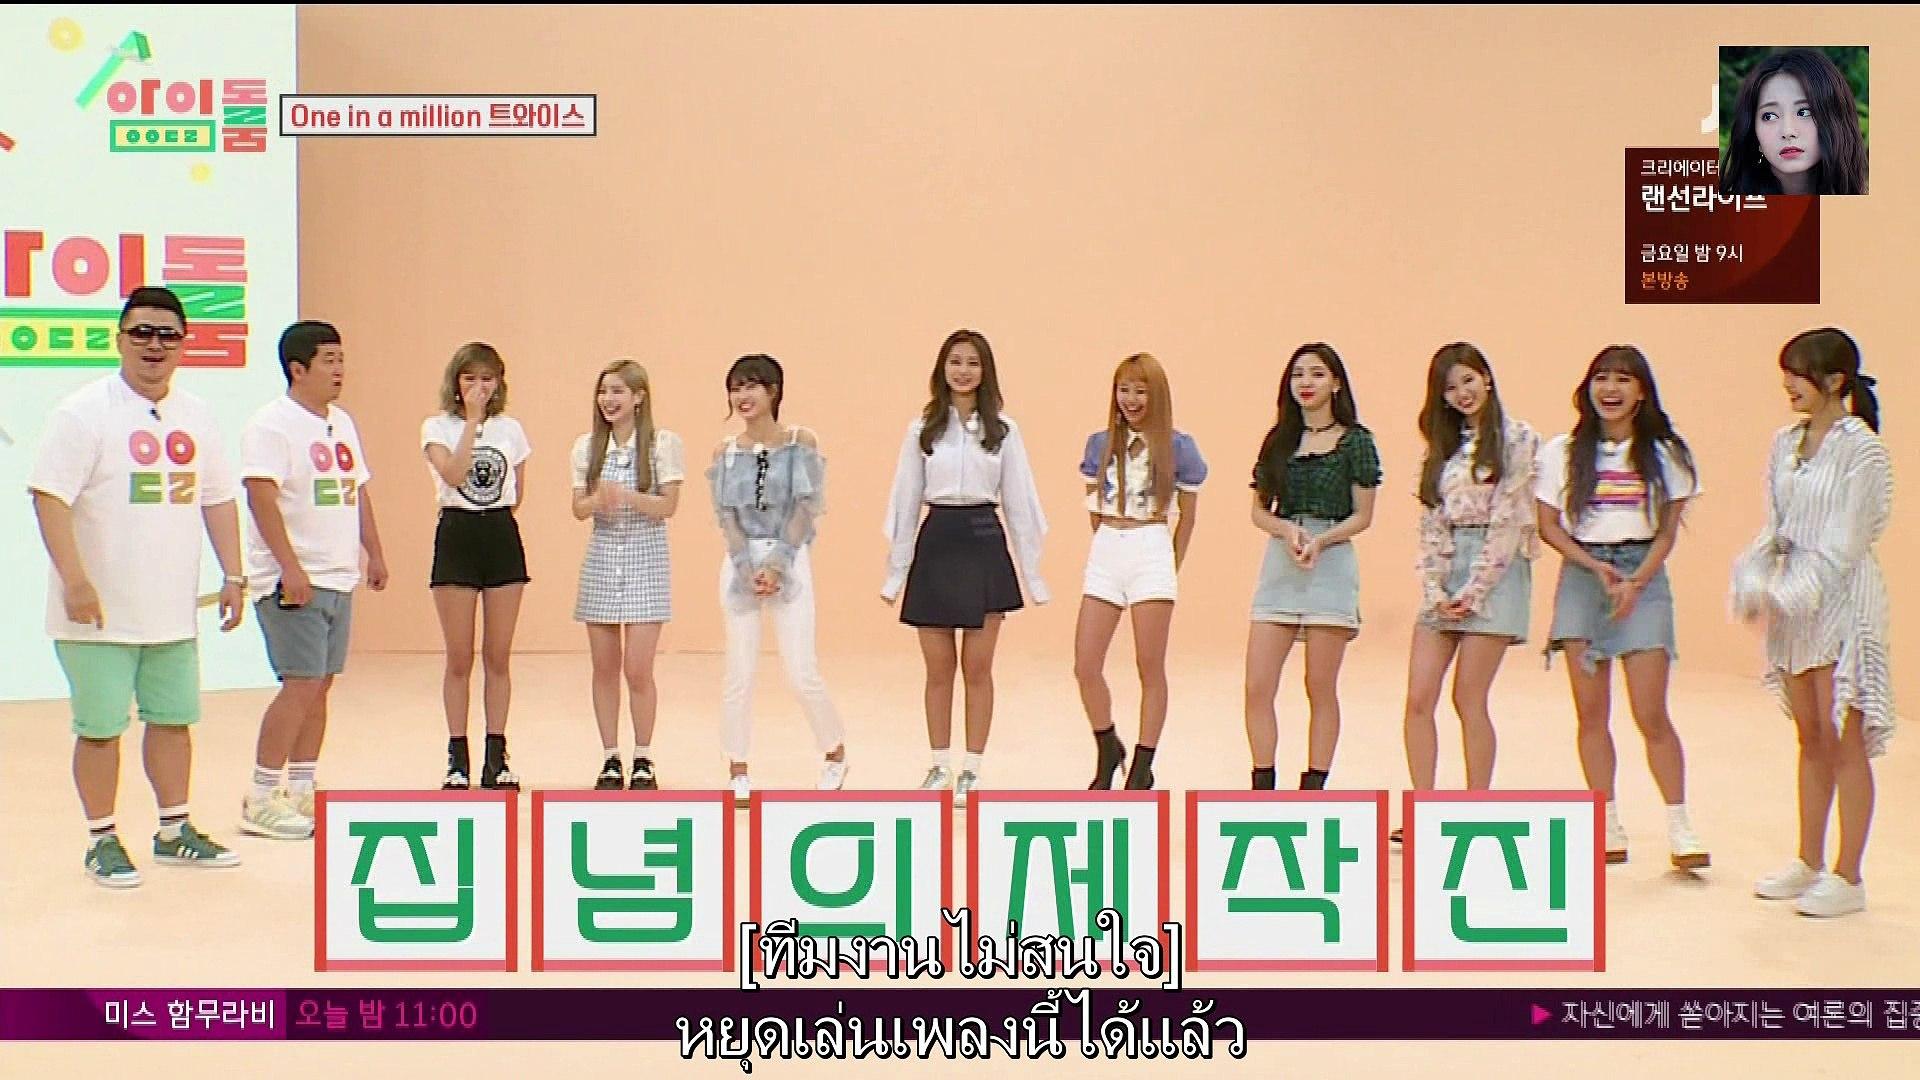 [Thaisub] Twice DTNA Idol Room Ep 10 Part 1/2